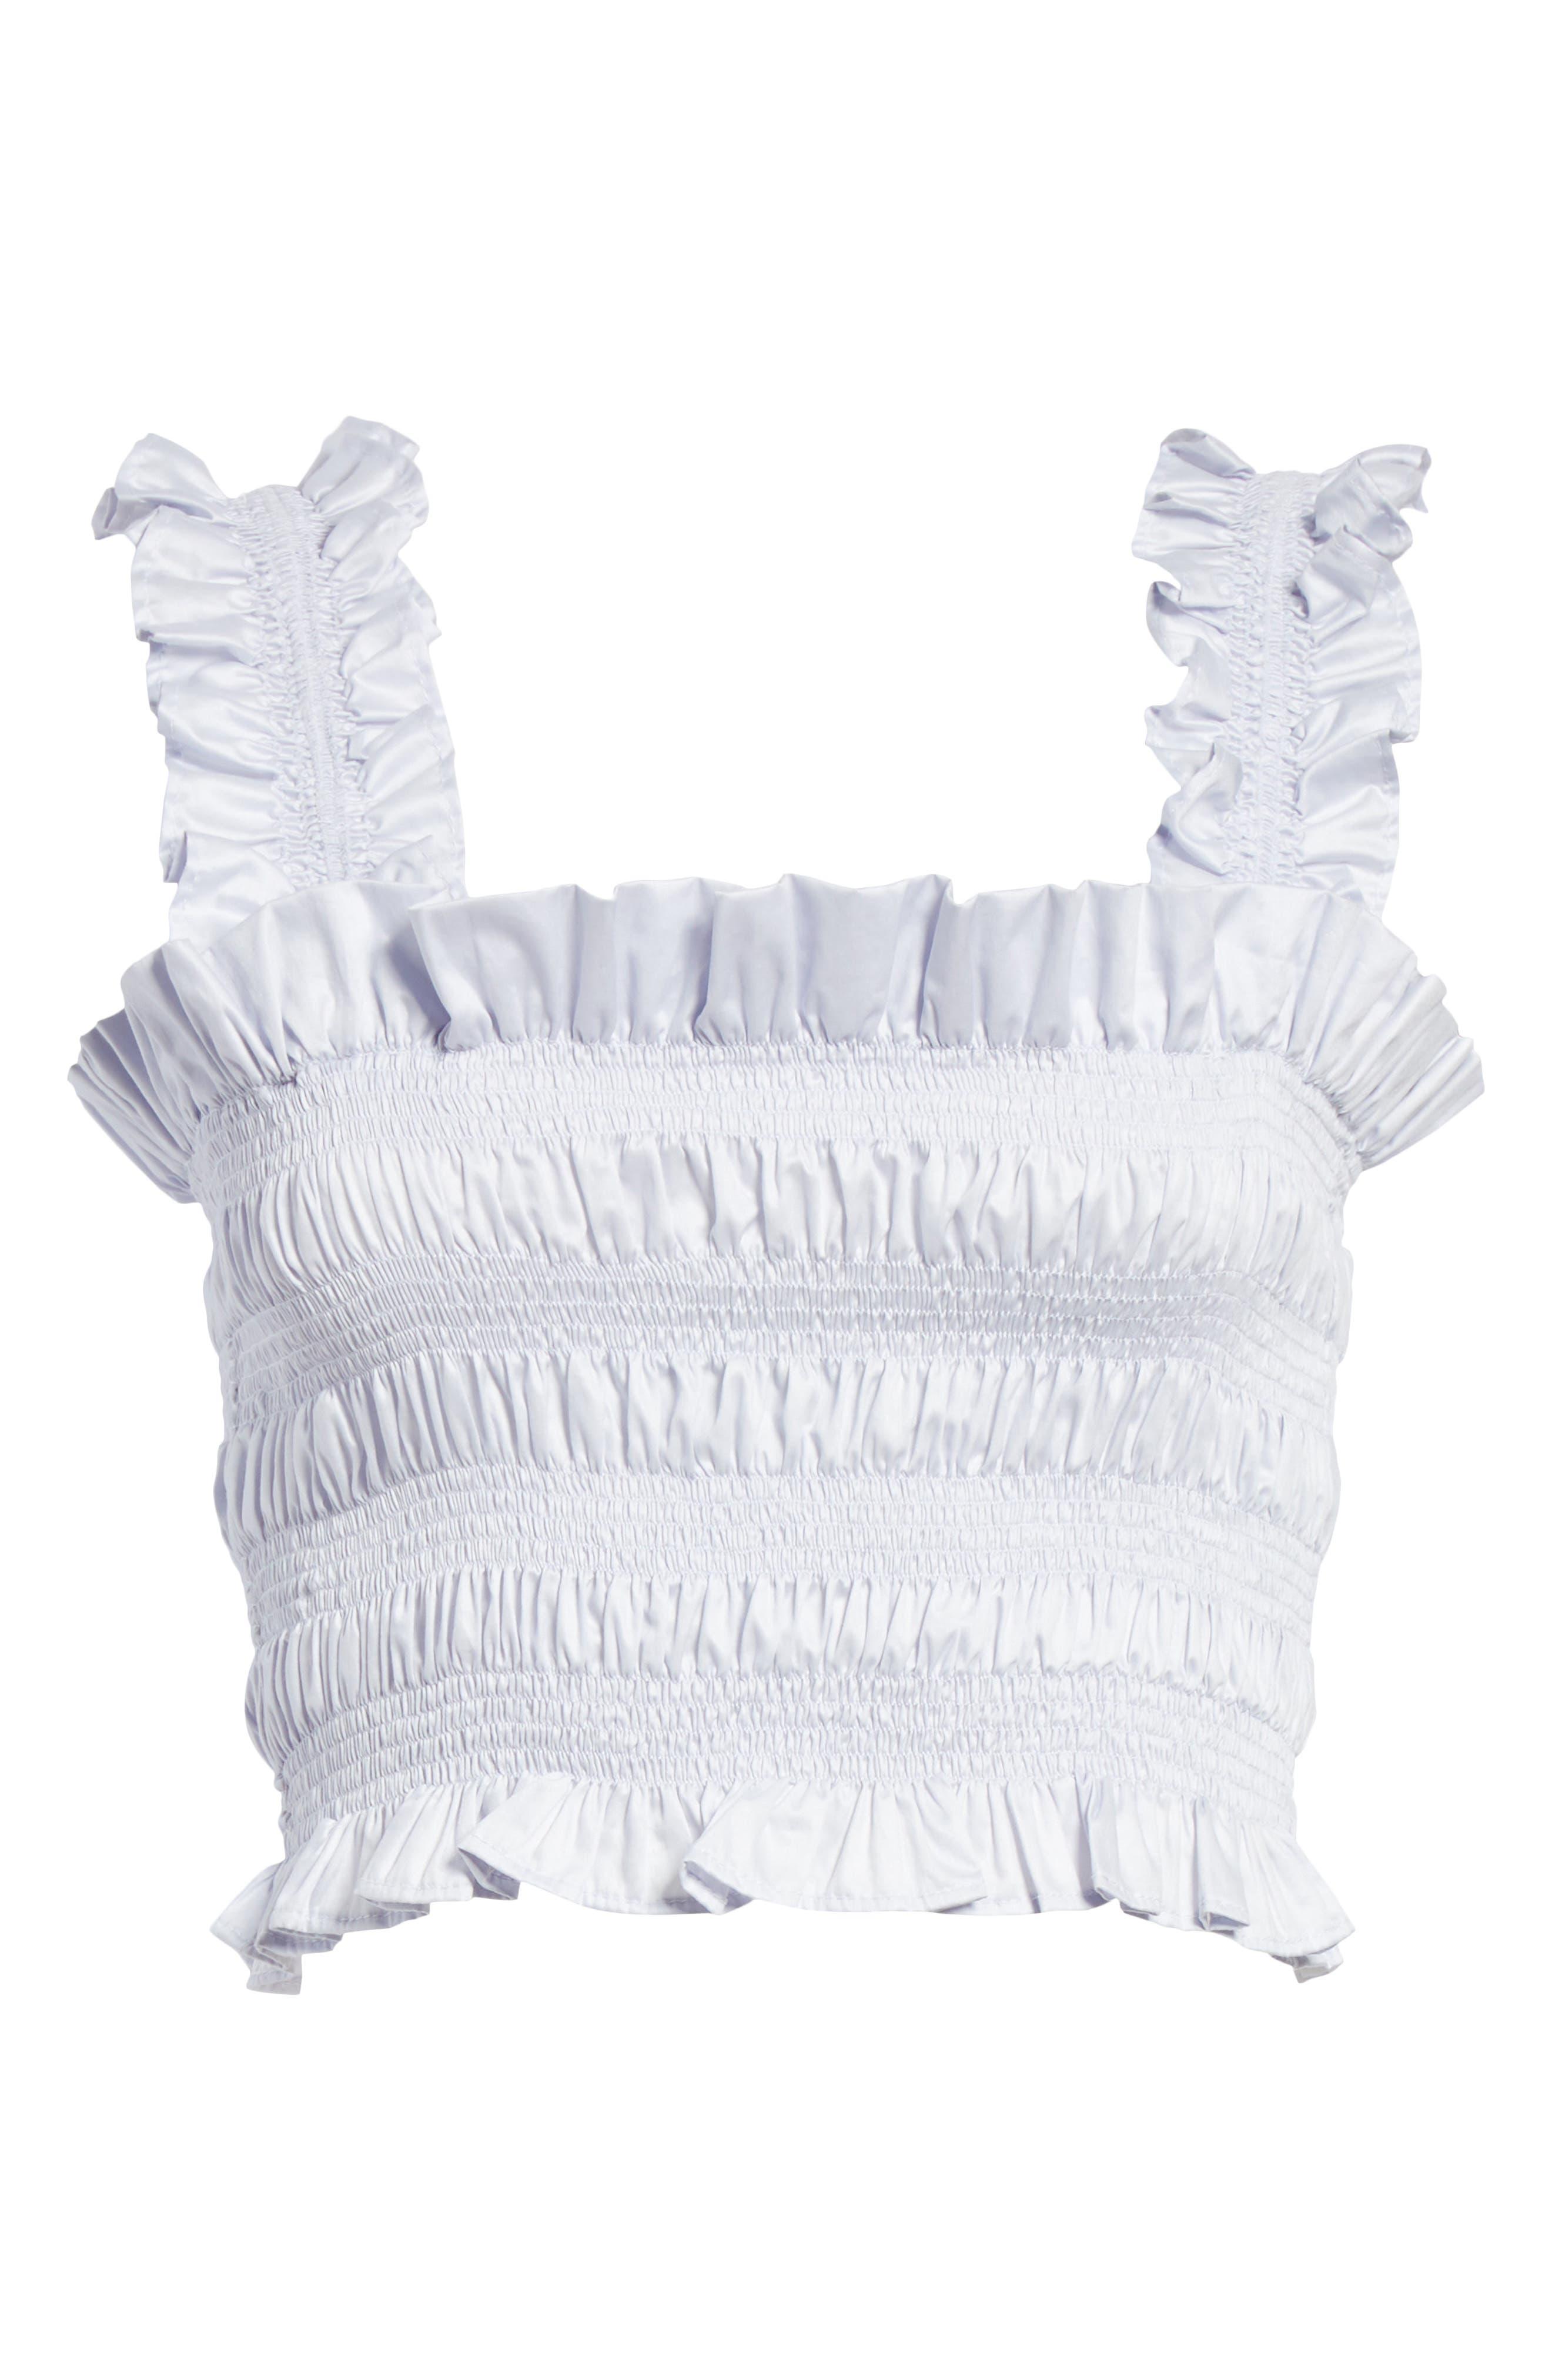 REBECCA TAYLOR, Smocked Sleeveless Cotton Top, Alternate thumbnail 6, color, 458